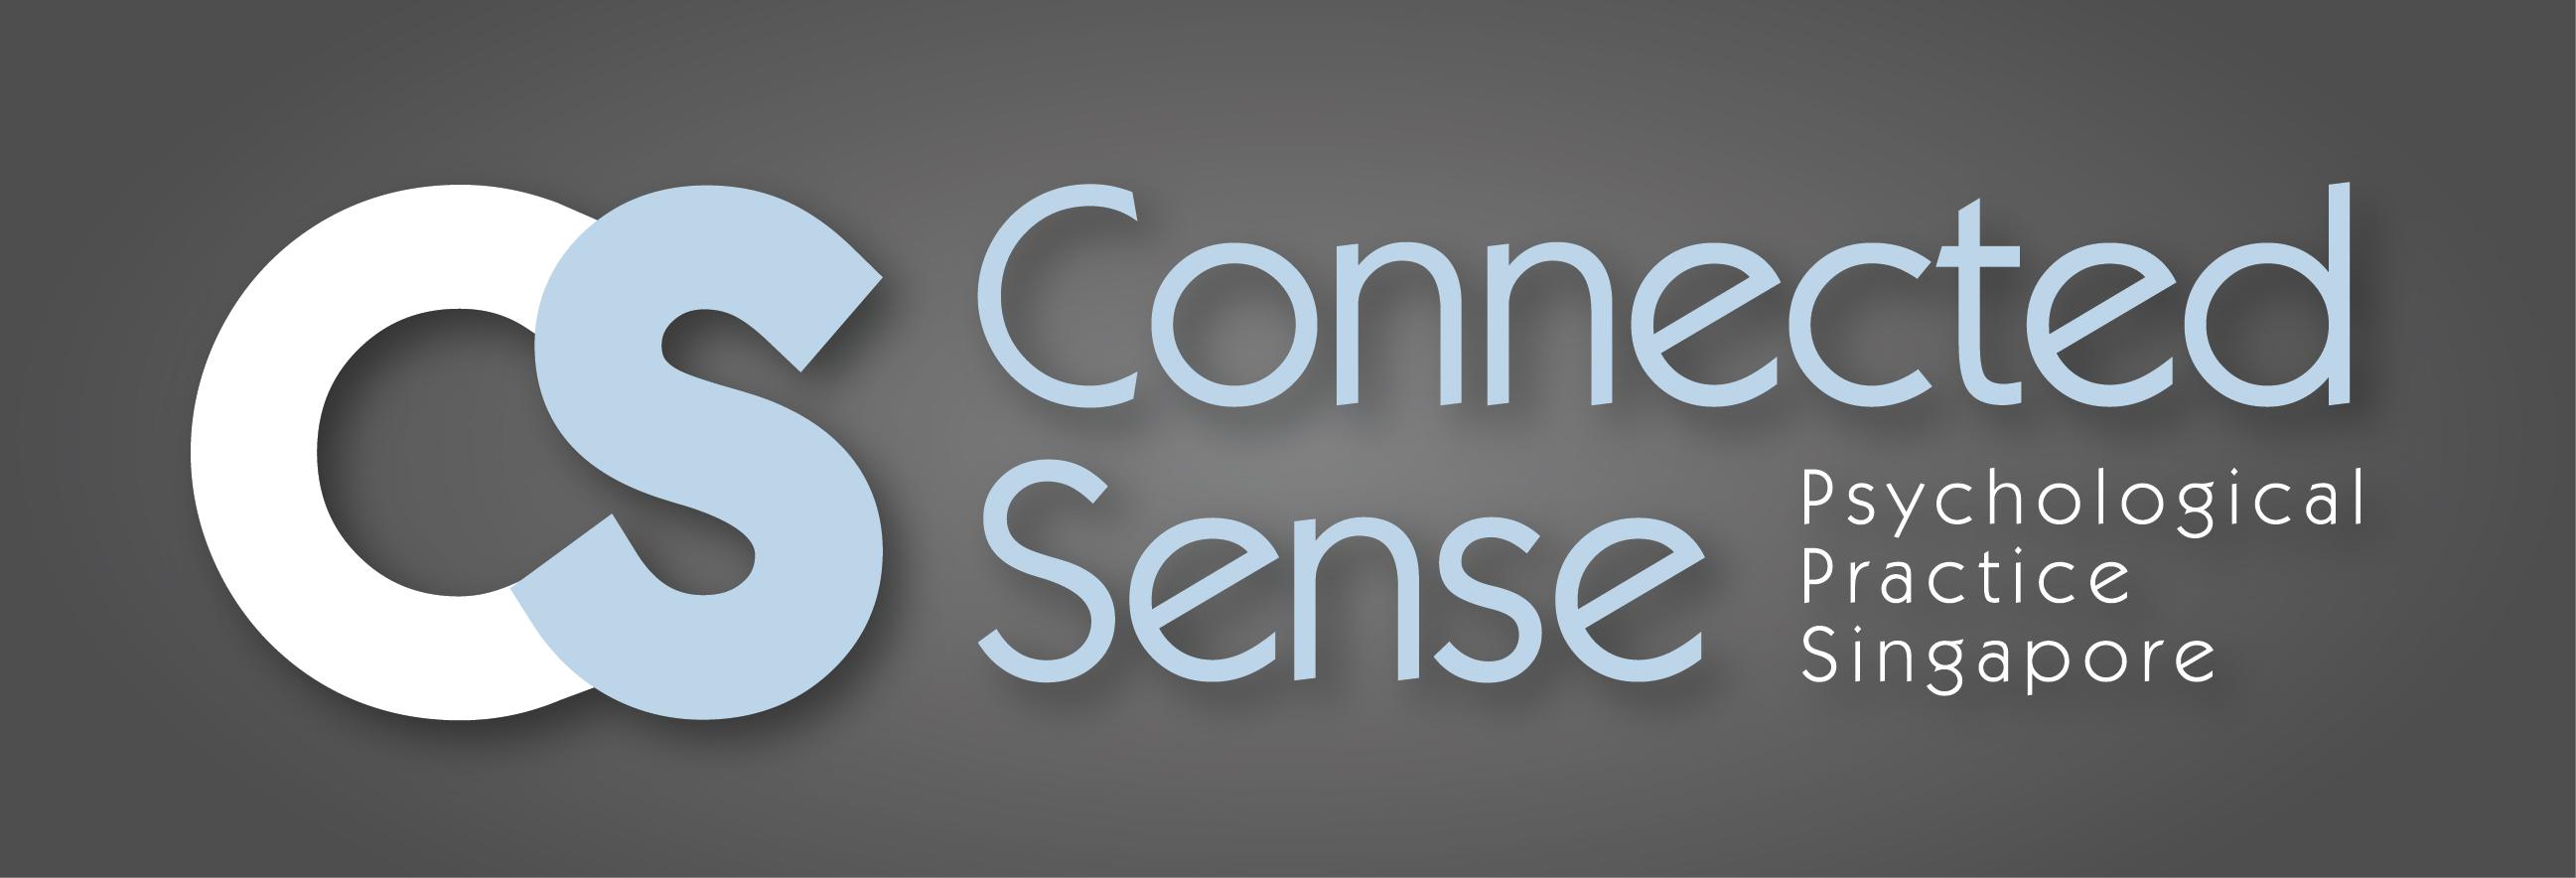 Connected Sense Psychology